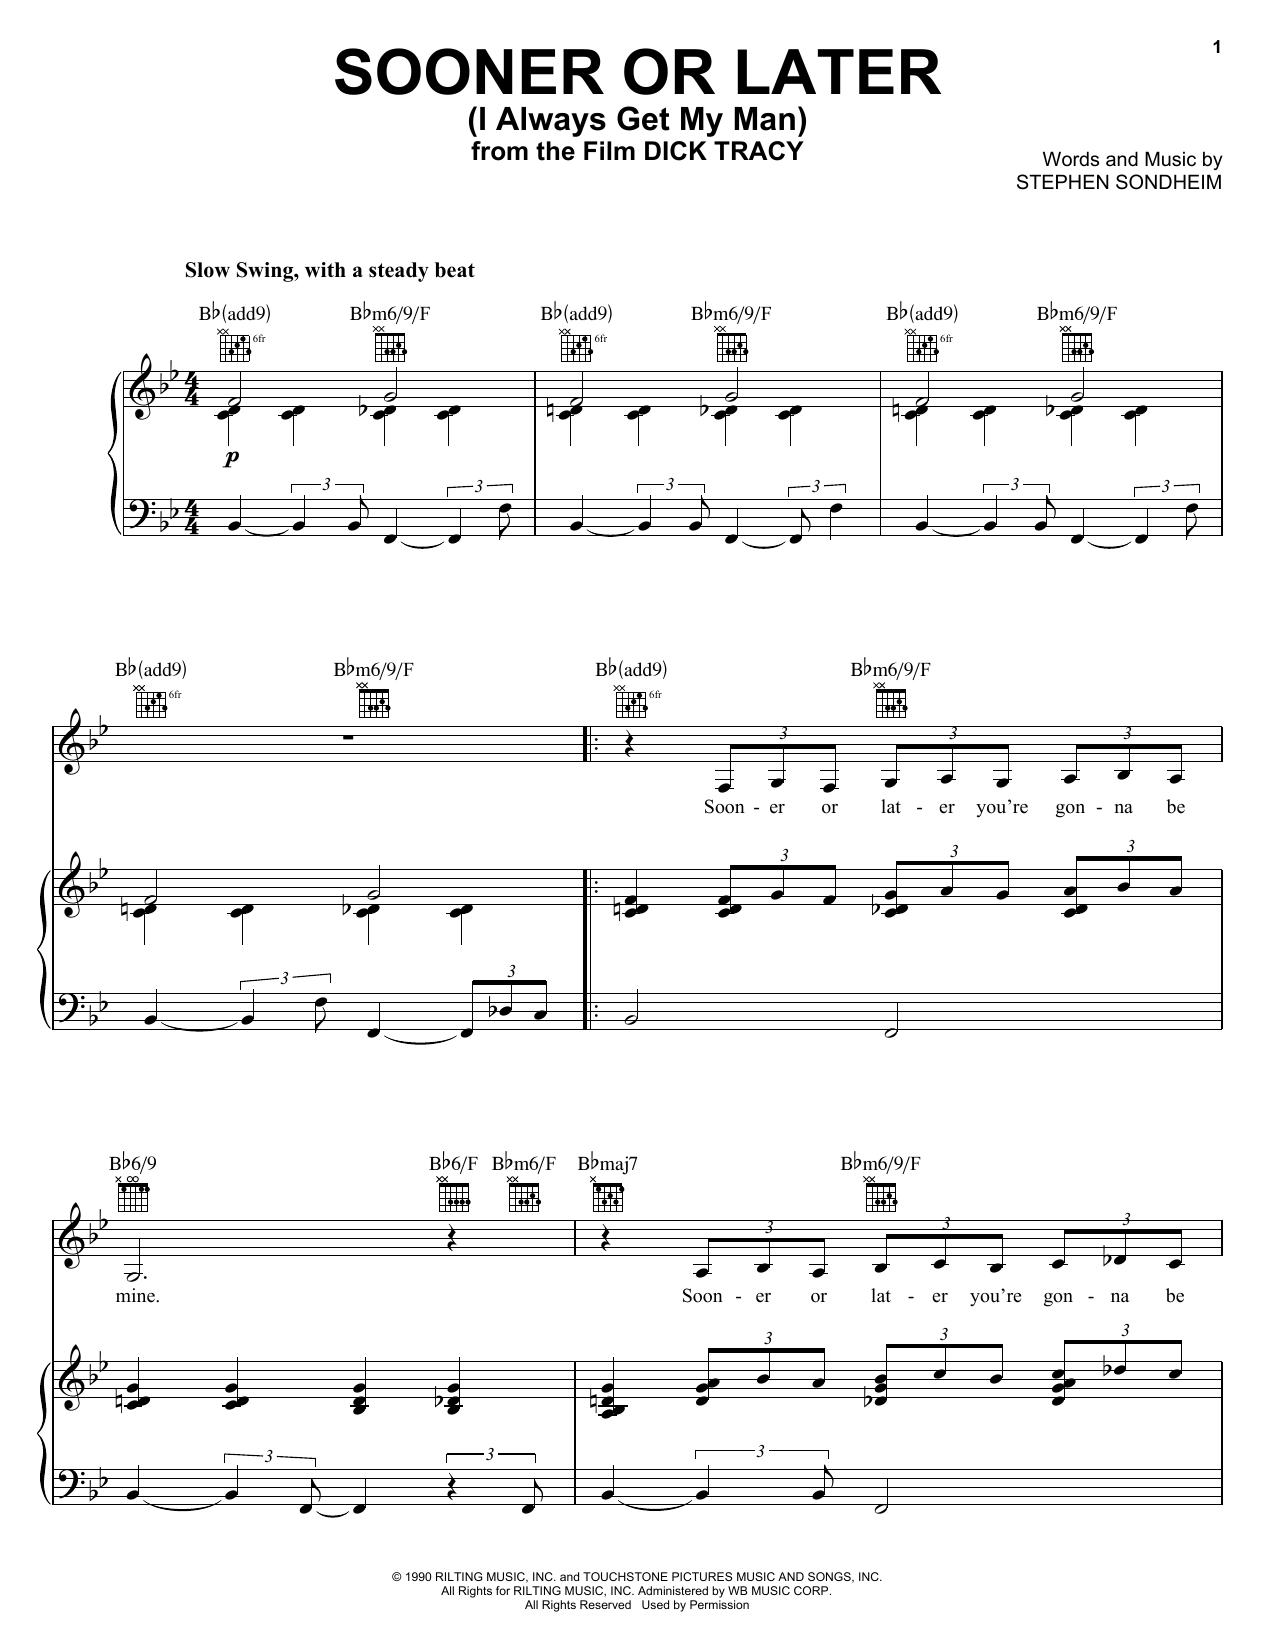 Stephen Sondheim Sooner Or Later (I Always Get My Man) sheet music notes and chords. Download Printable PDF.